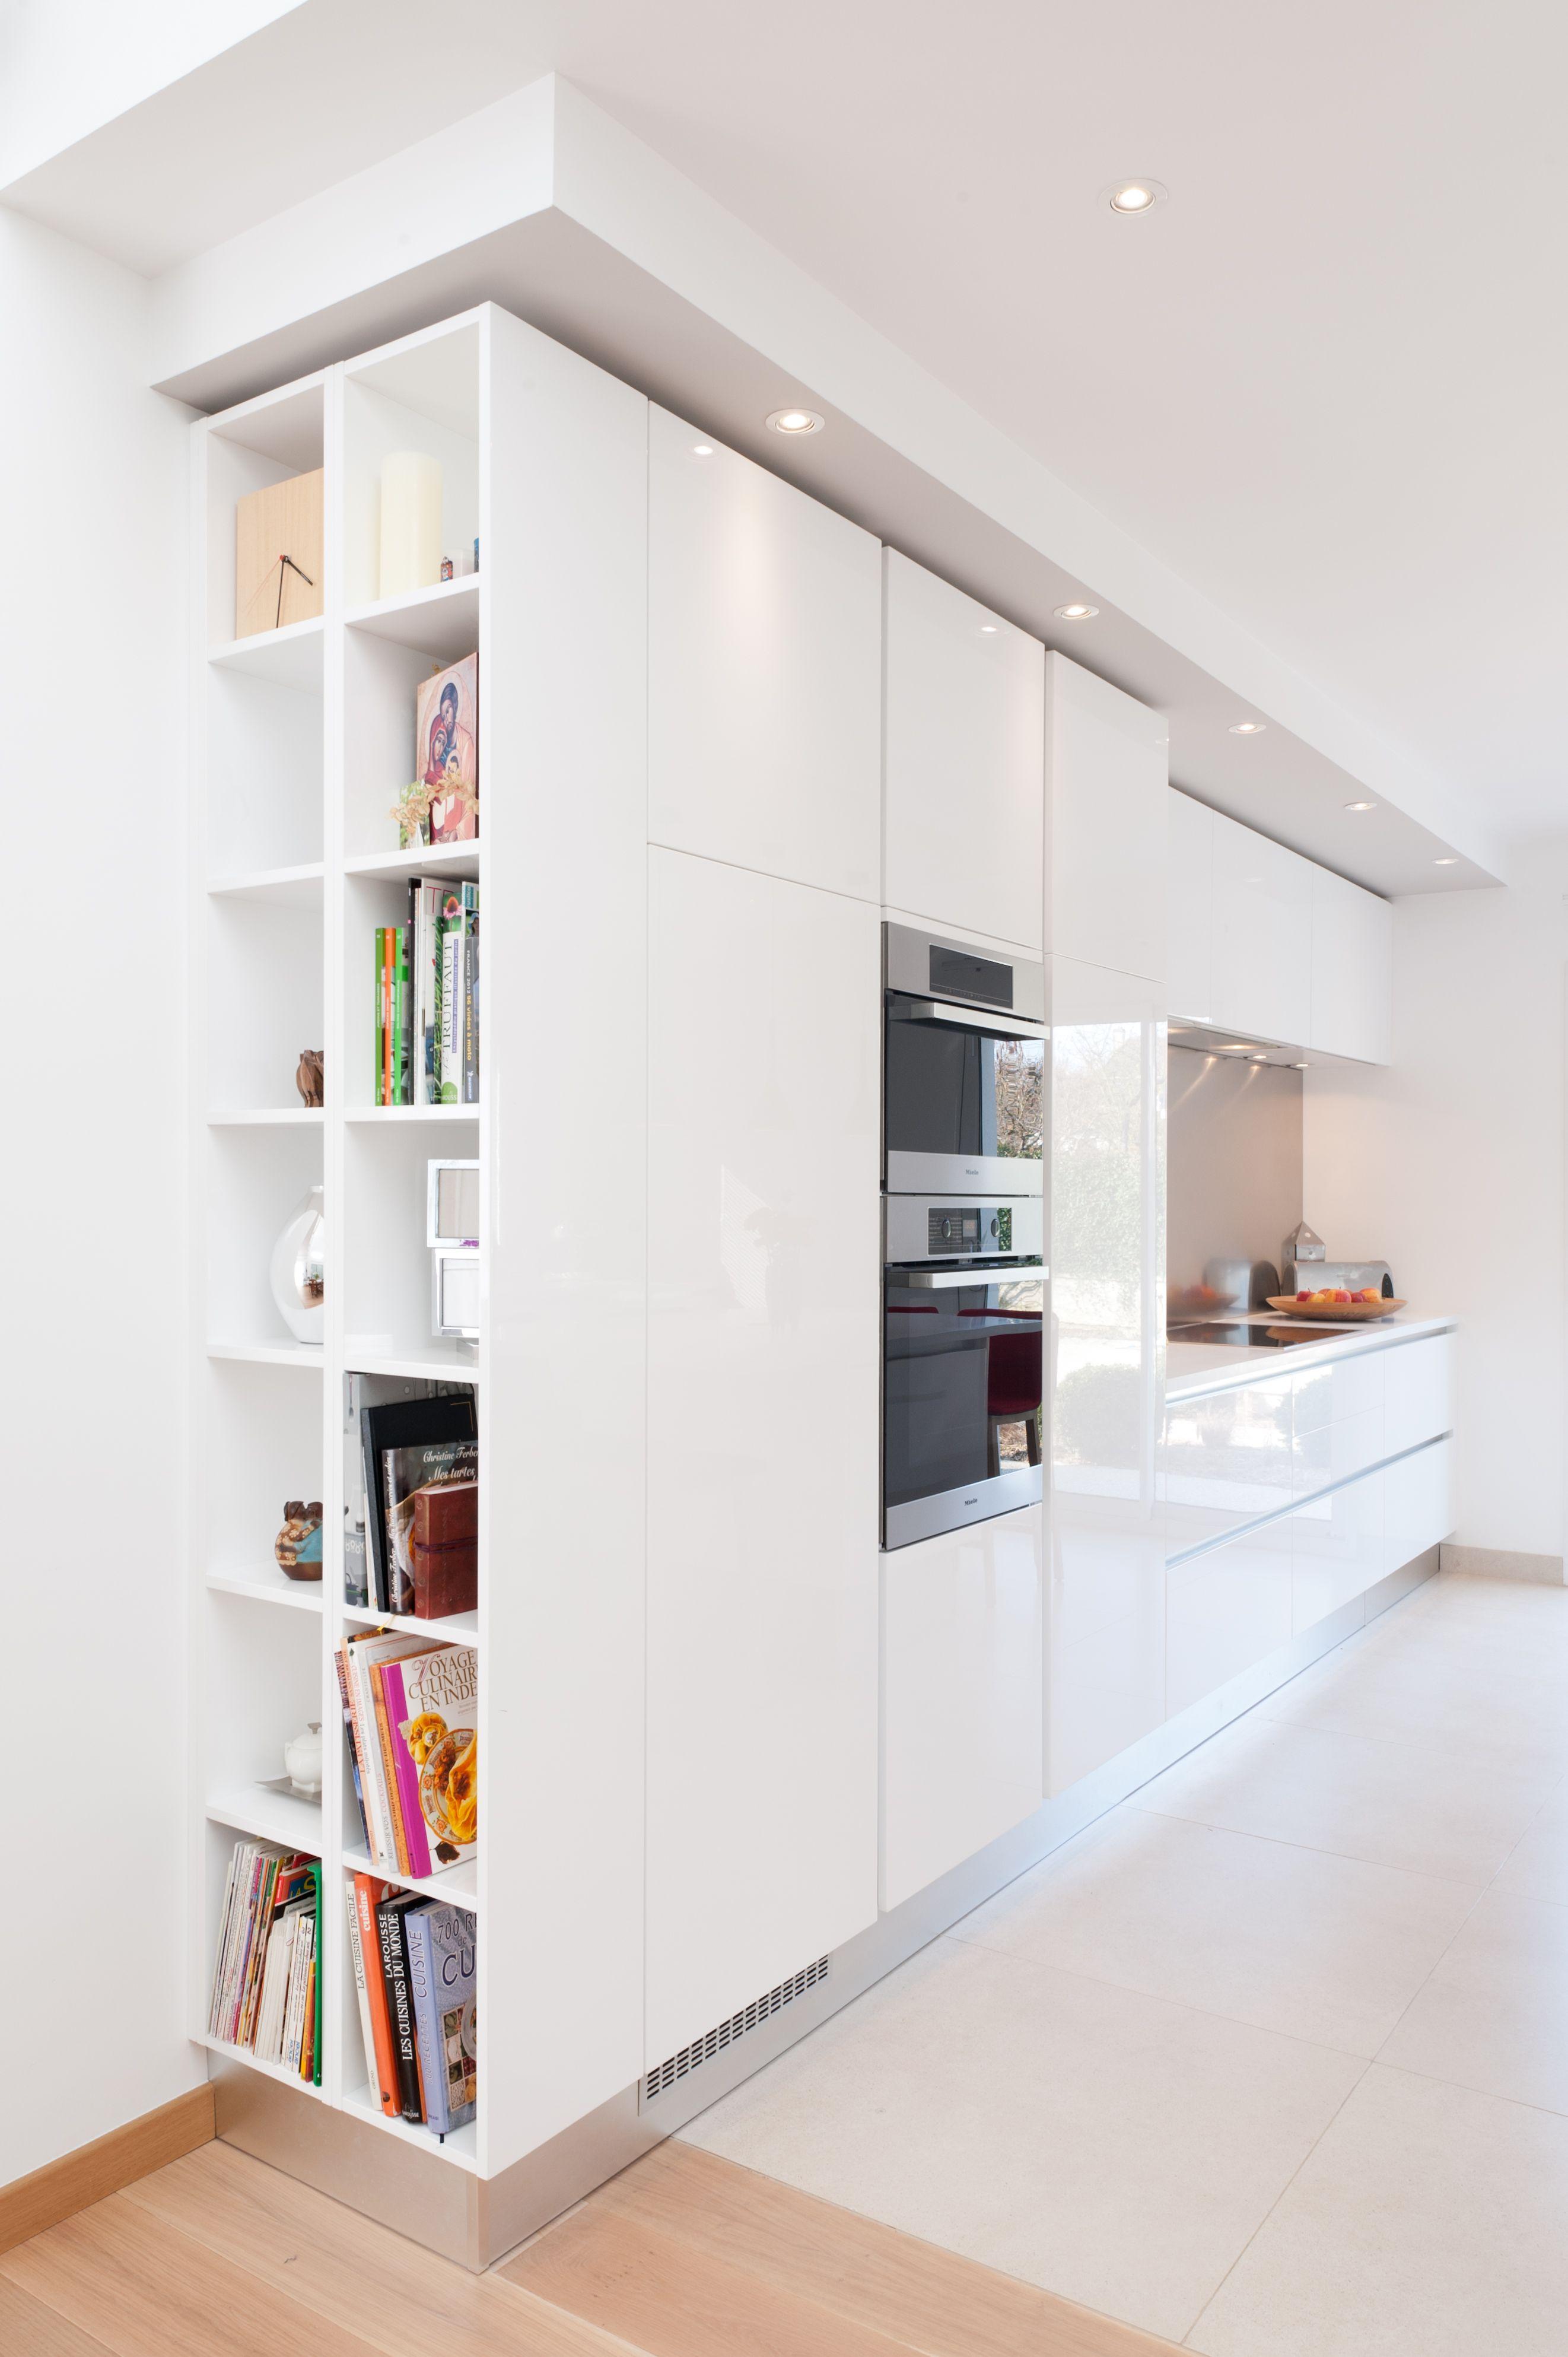 Armony Cucine Arredo Interni Cucina Design Cucine Soffitti Cucina